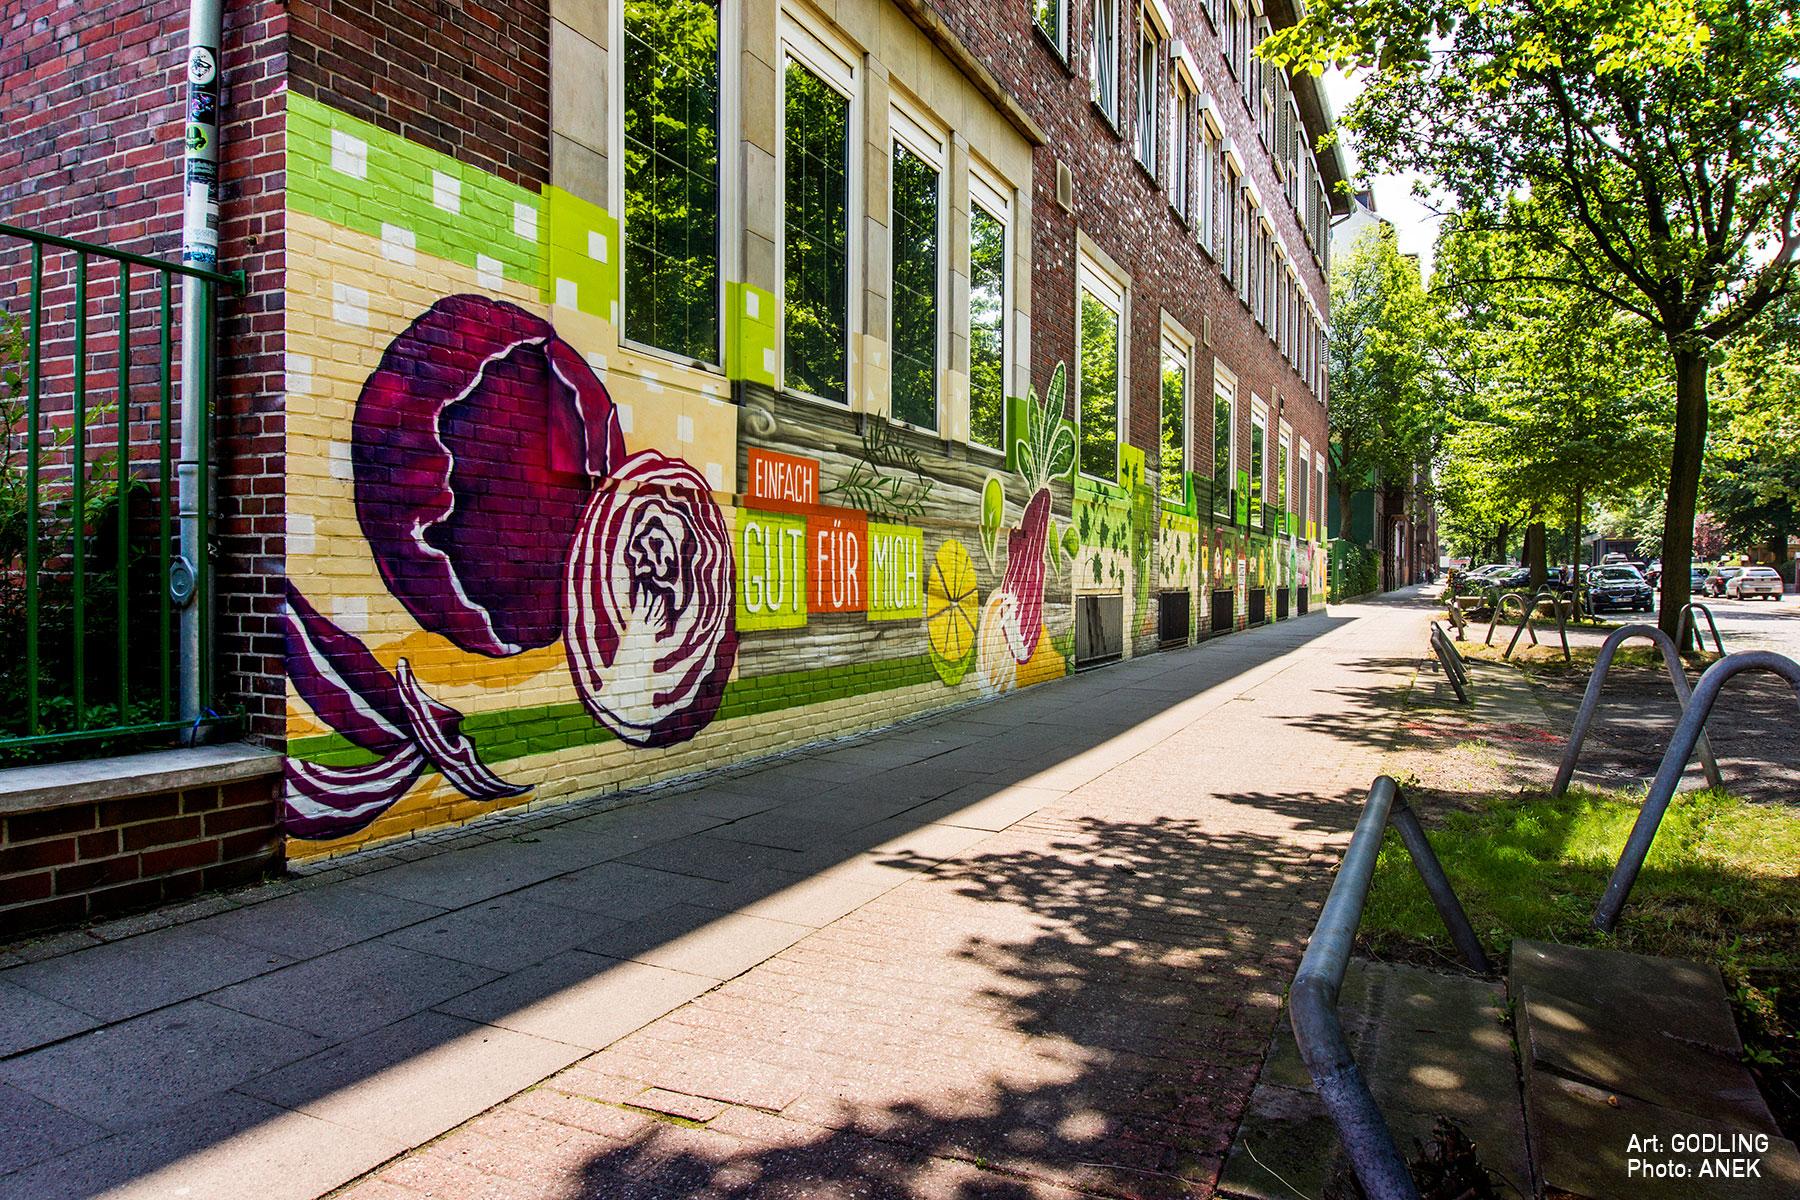 KÜHNE STREET ART